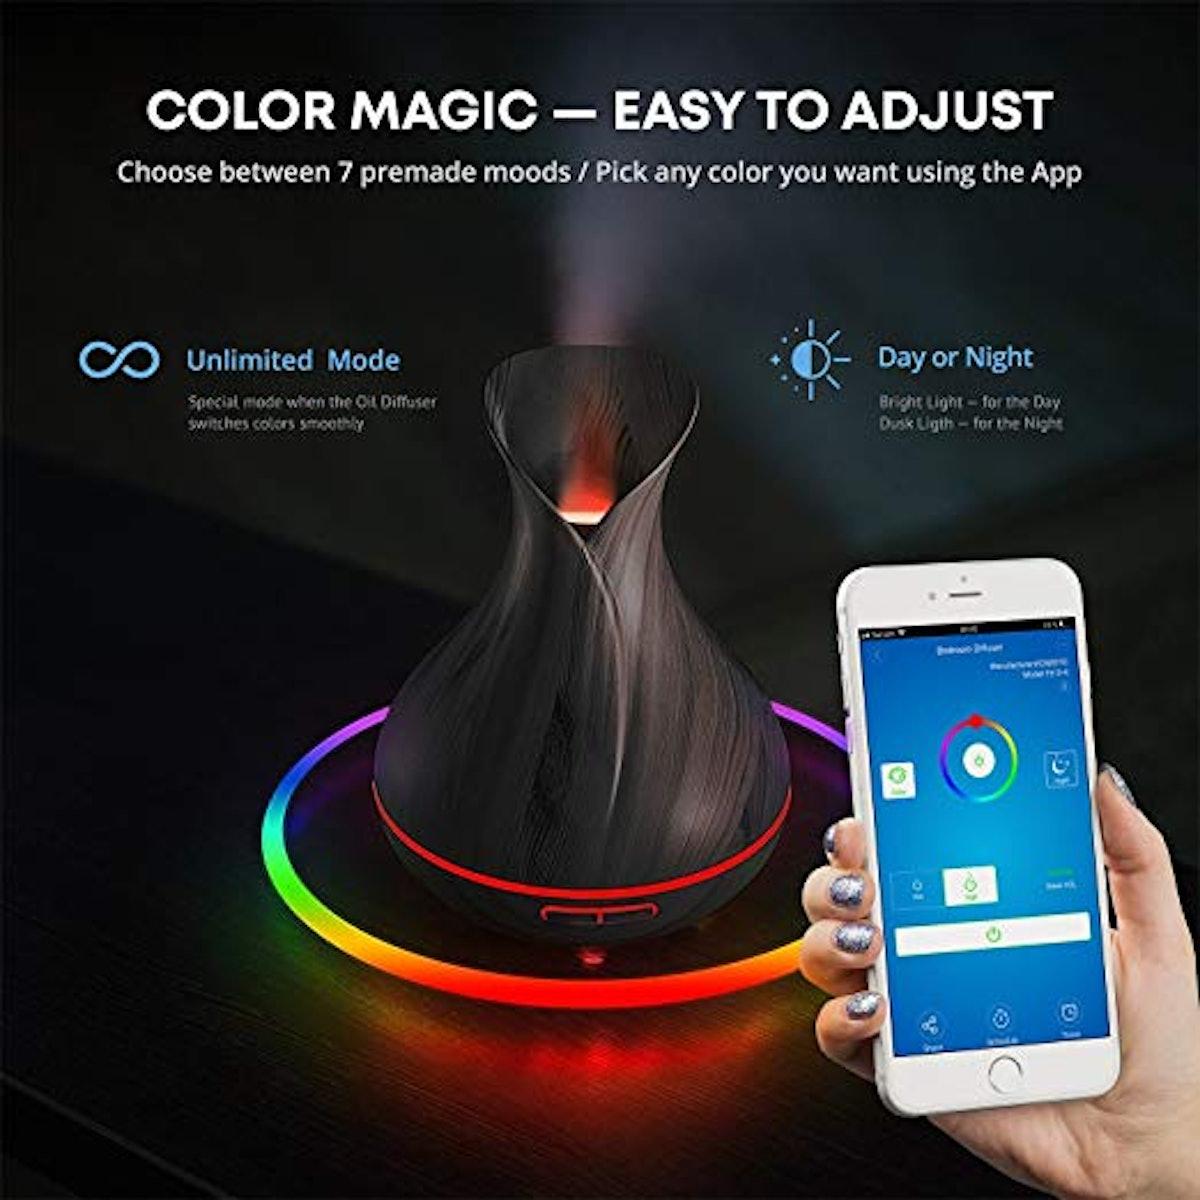 Smart Wifi Essential Oil Aromatherapy Diffuser & Humidifier